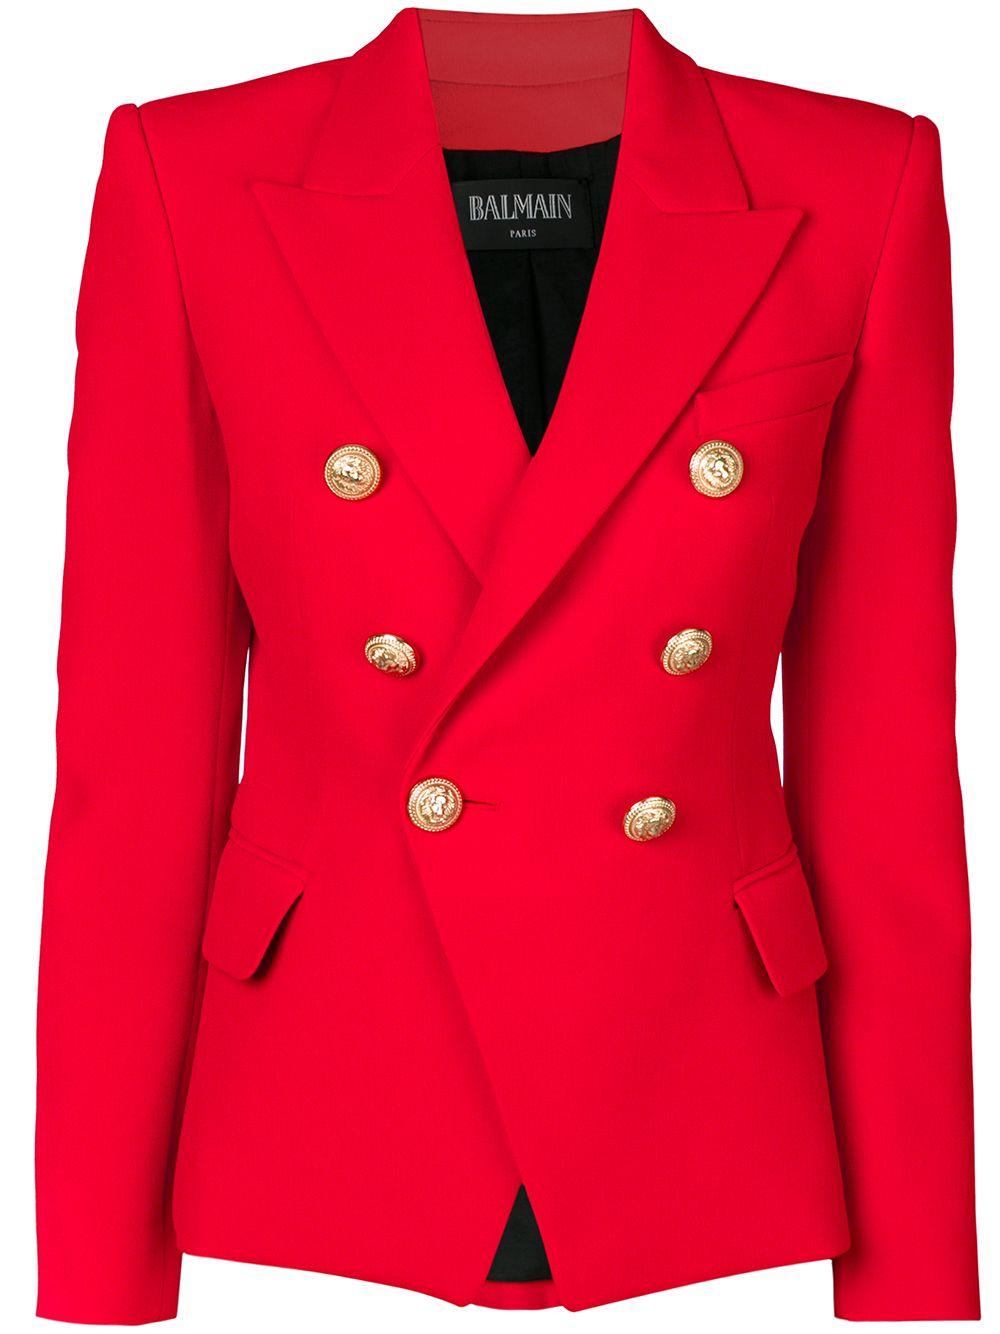 BALMAIN Double-breasted Jacket, £1,450